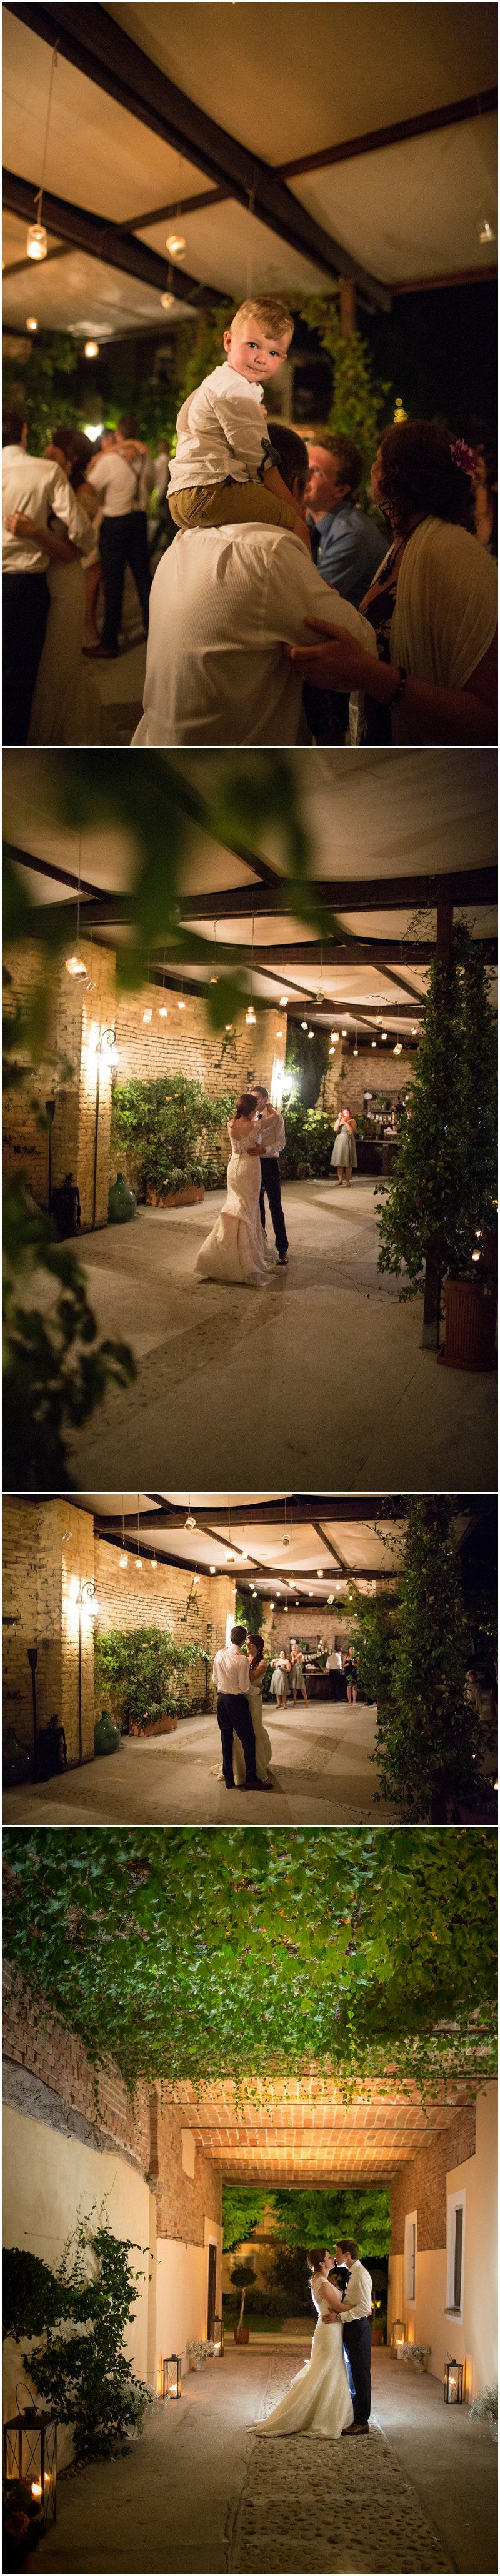 First dance at La Villa wedding ceremony Italy